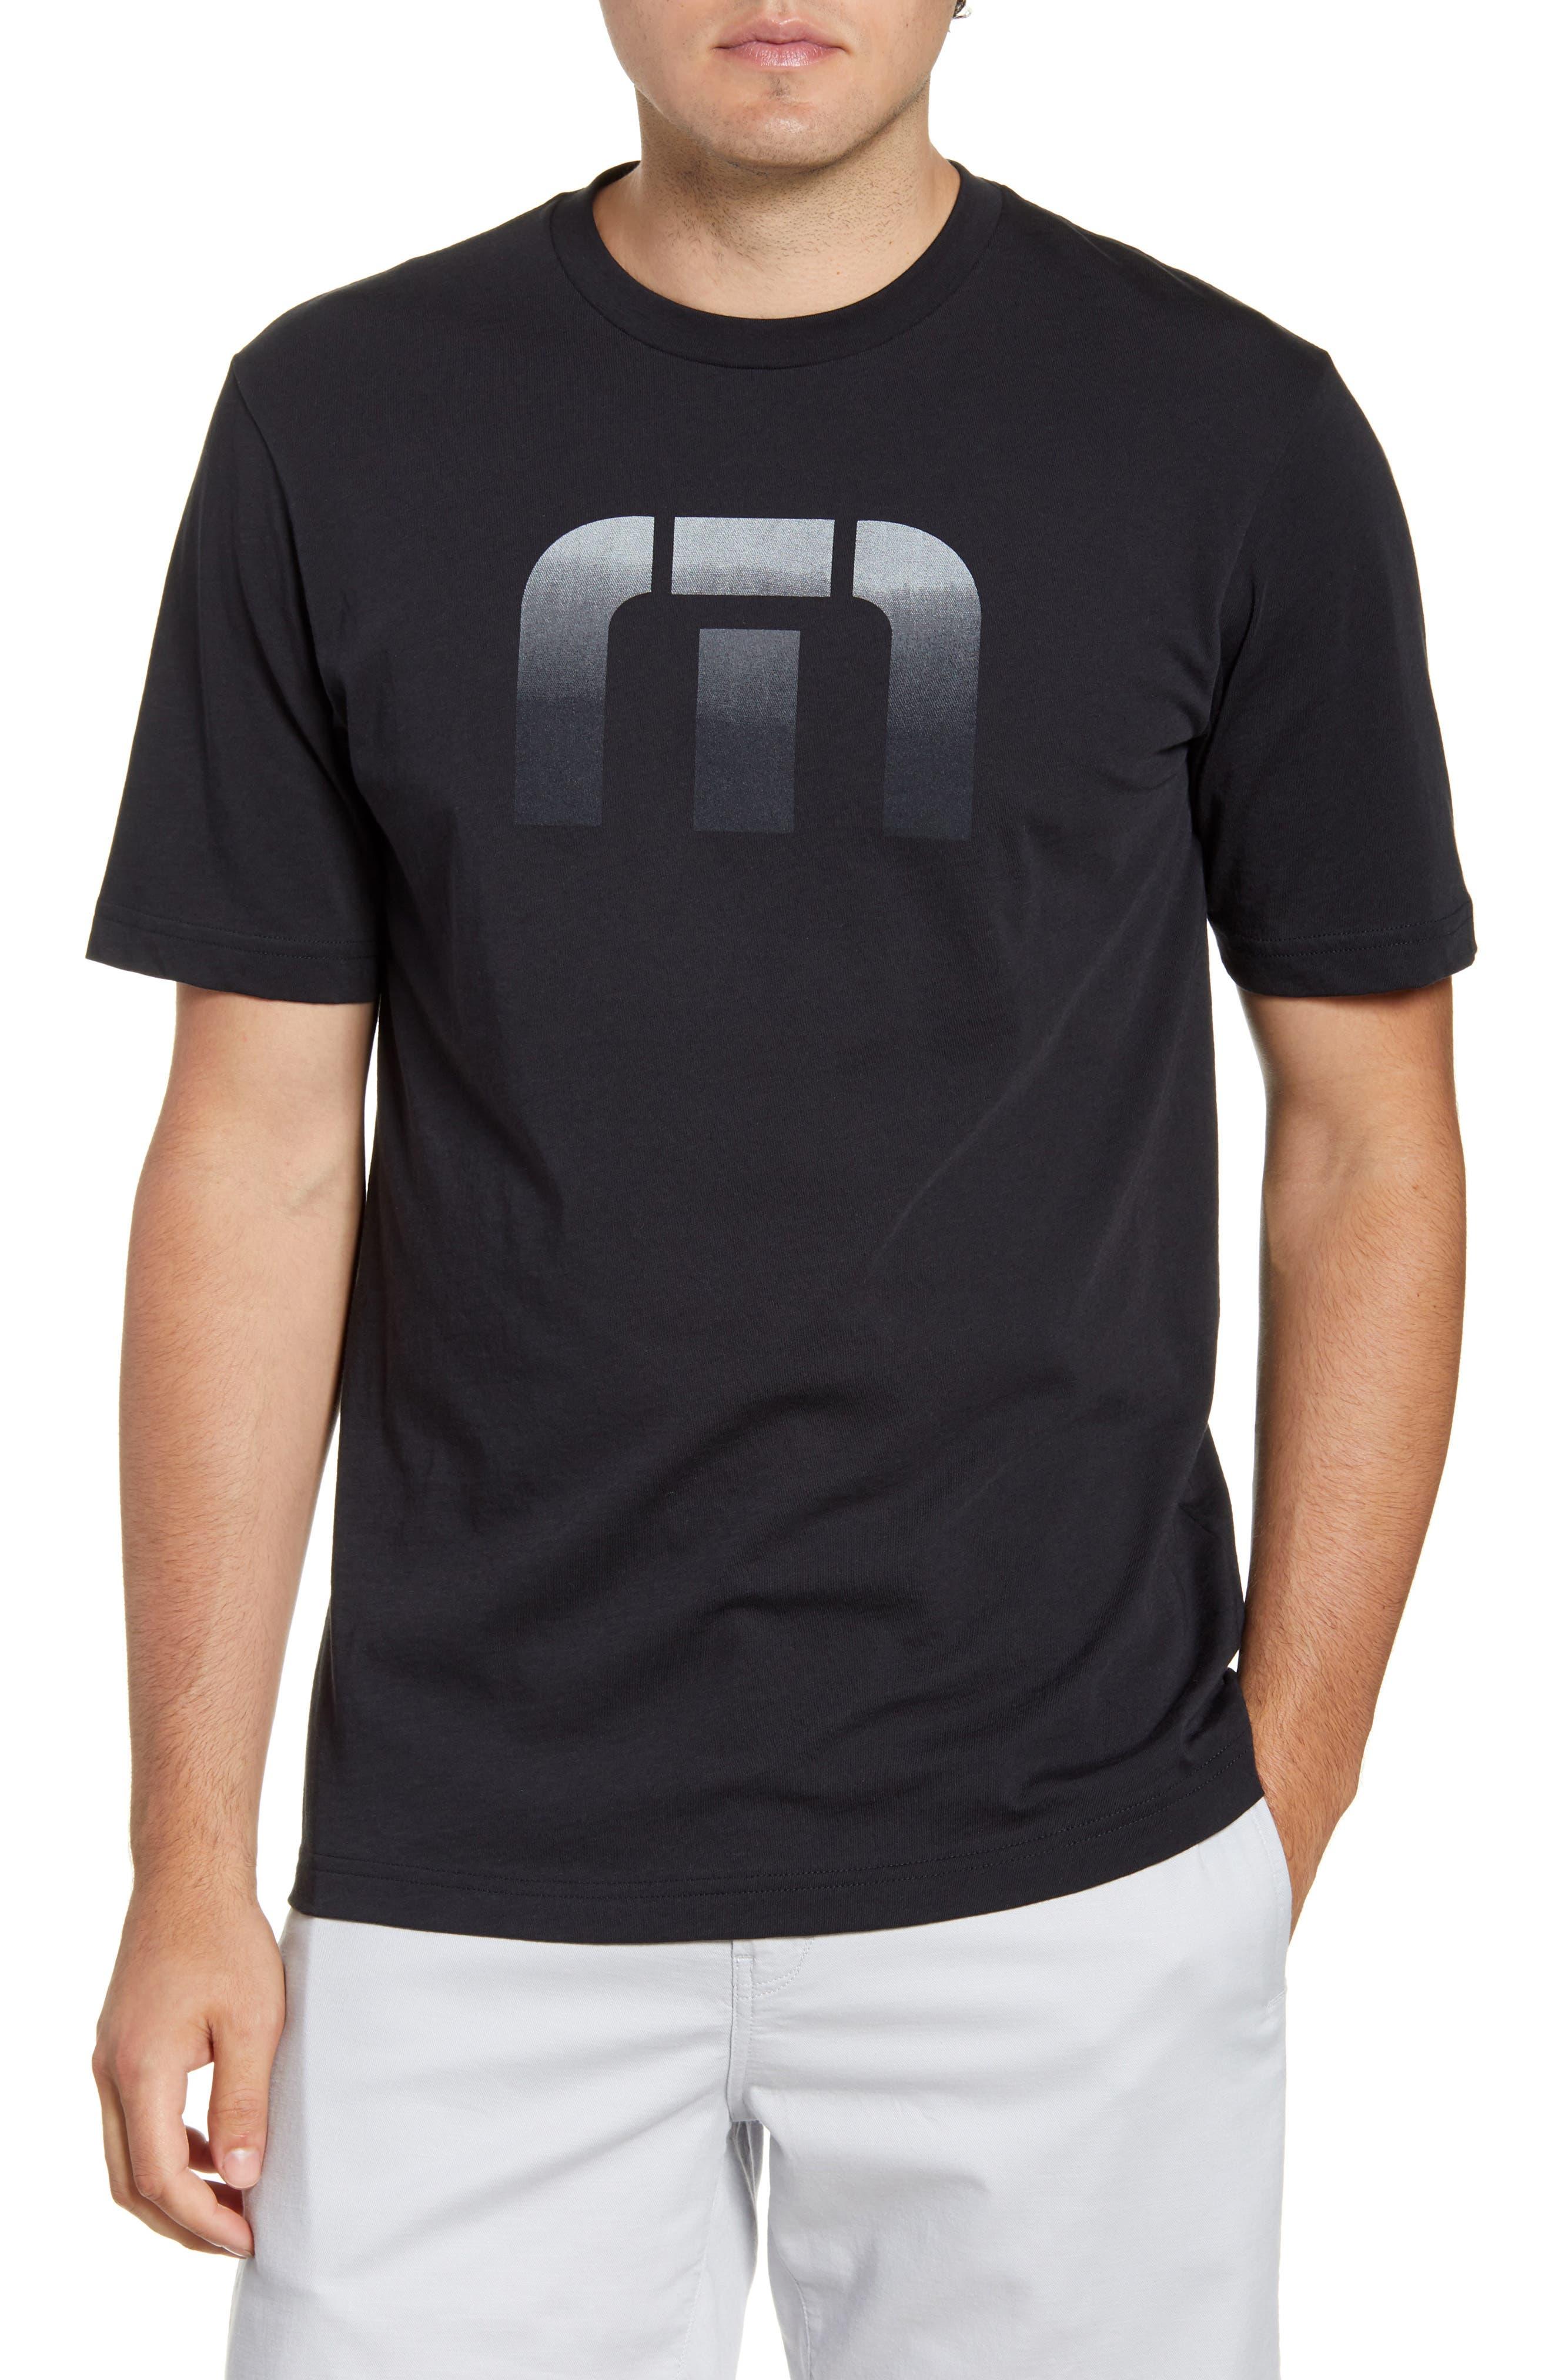 Image of TRAVIS MATHEW Correal Short Sleeve T-Shirt